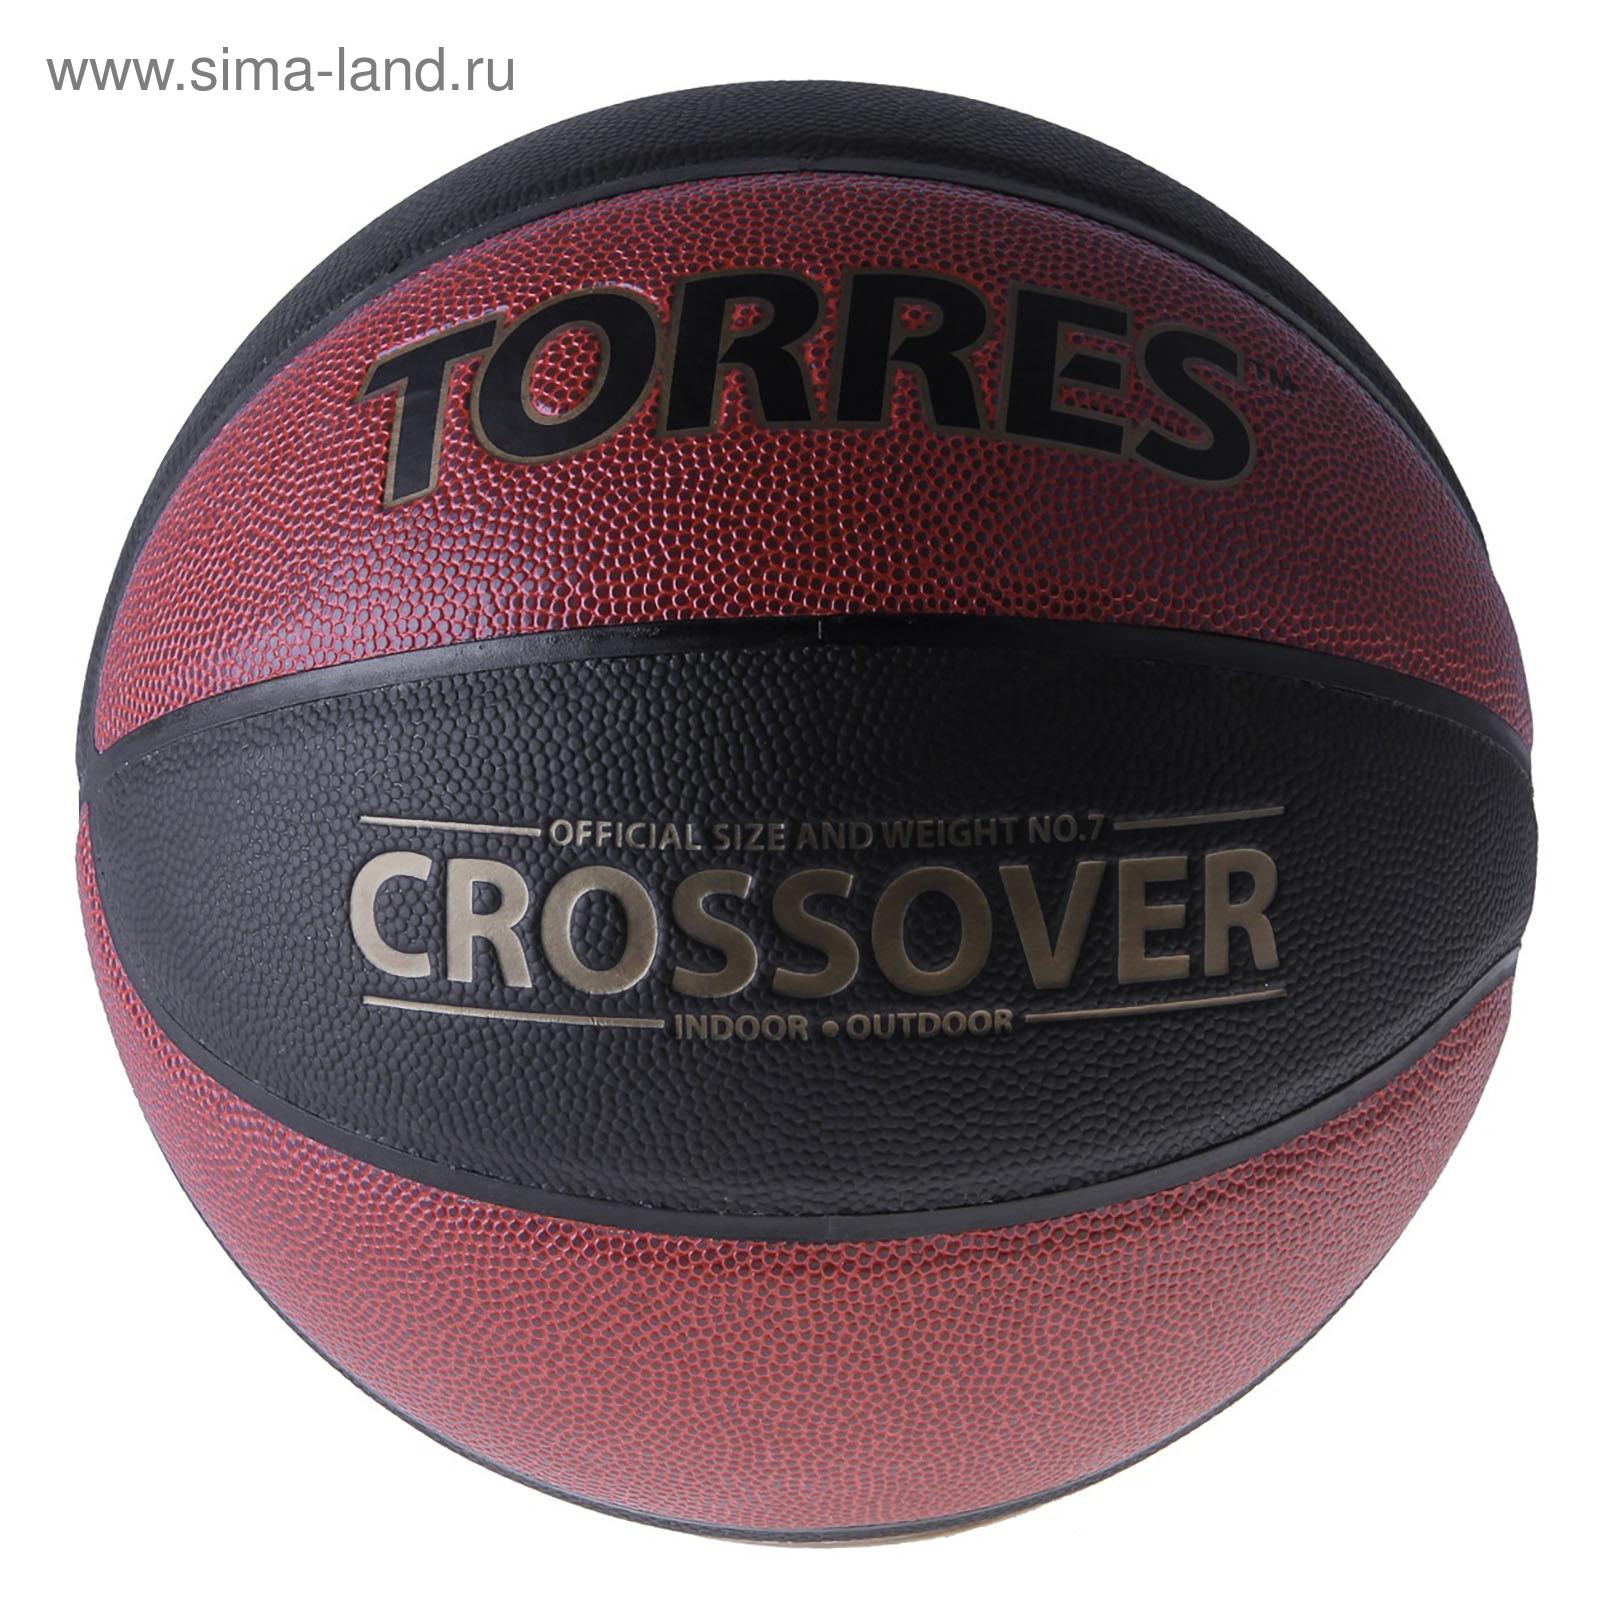 cb819029 Мяч баскетбольный Torres Crossover, B30097, размер 7 (746182 ...